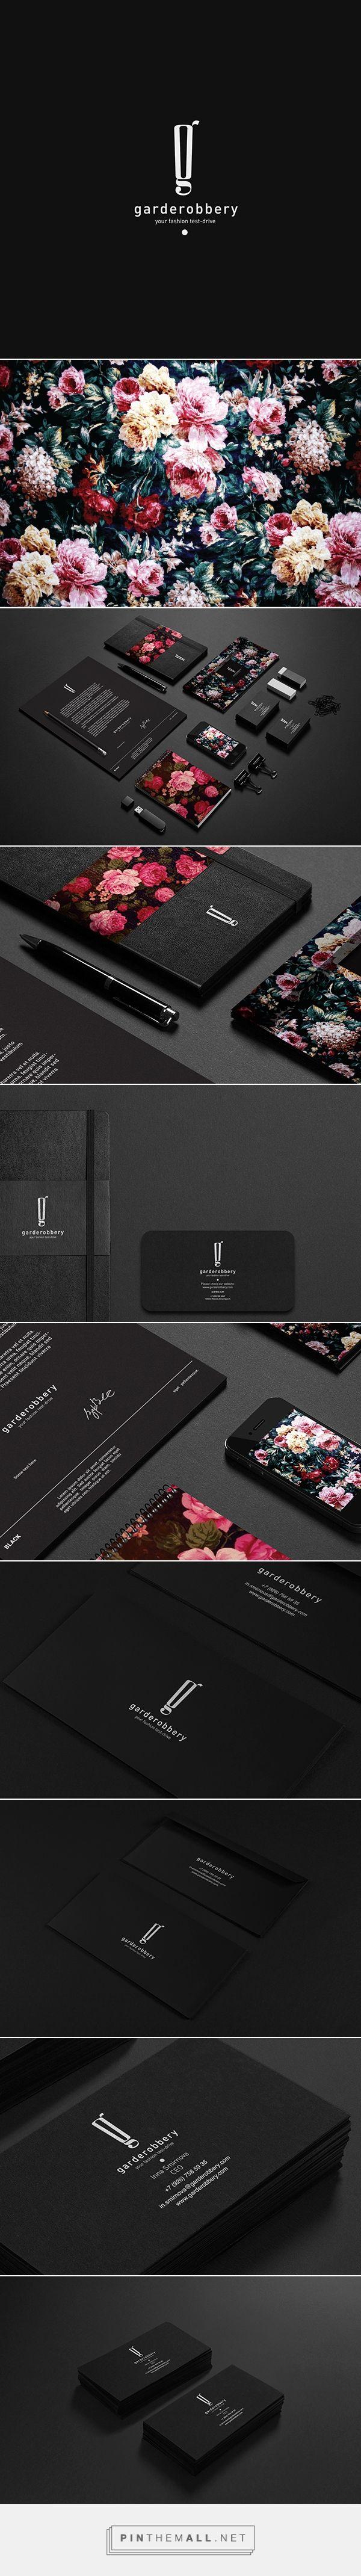 Garderobbery Branding by Pavel llyuk on Behance   Fivestar Branding – Design and Branding Agency & Inspiration Gallery